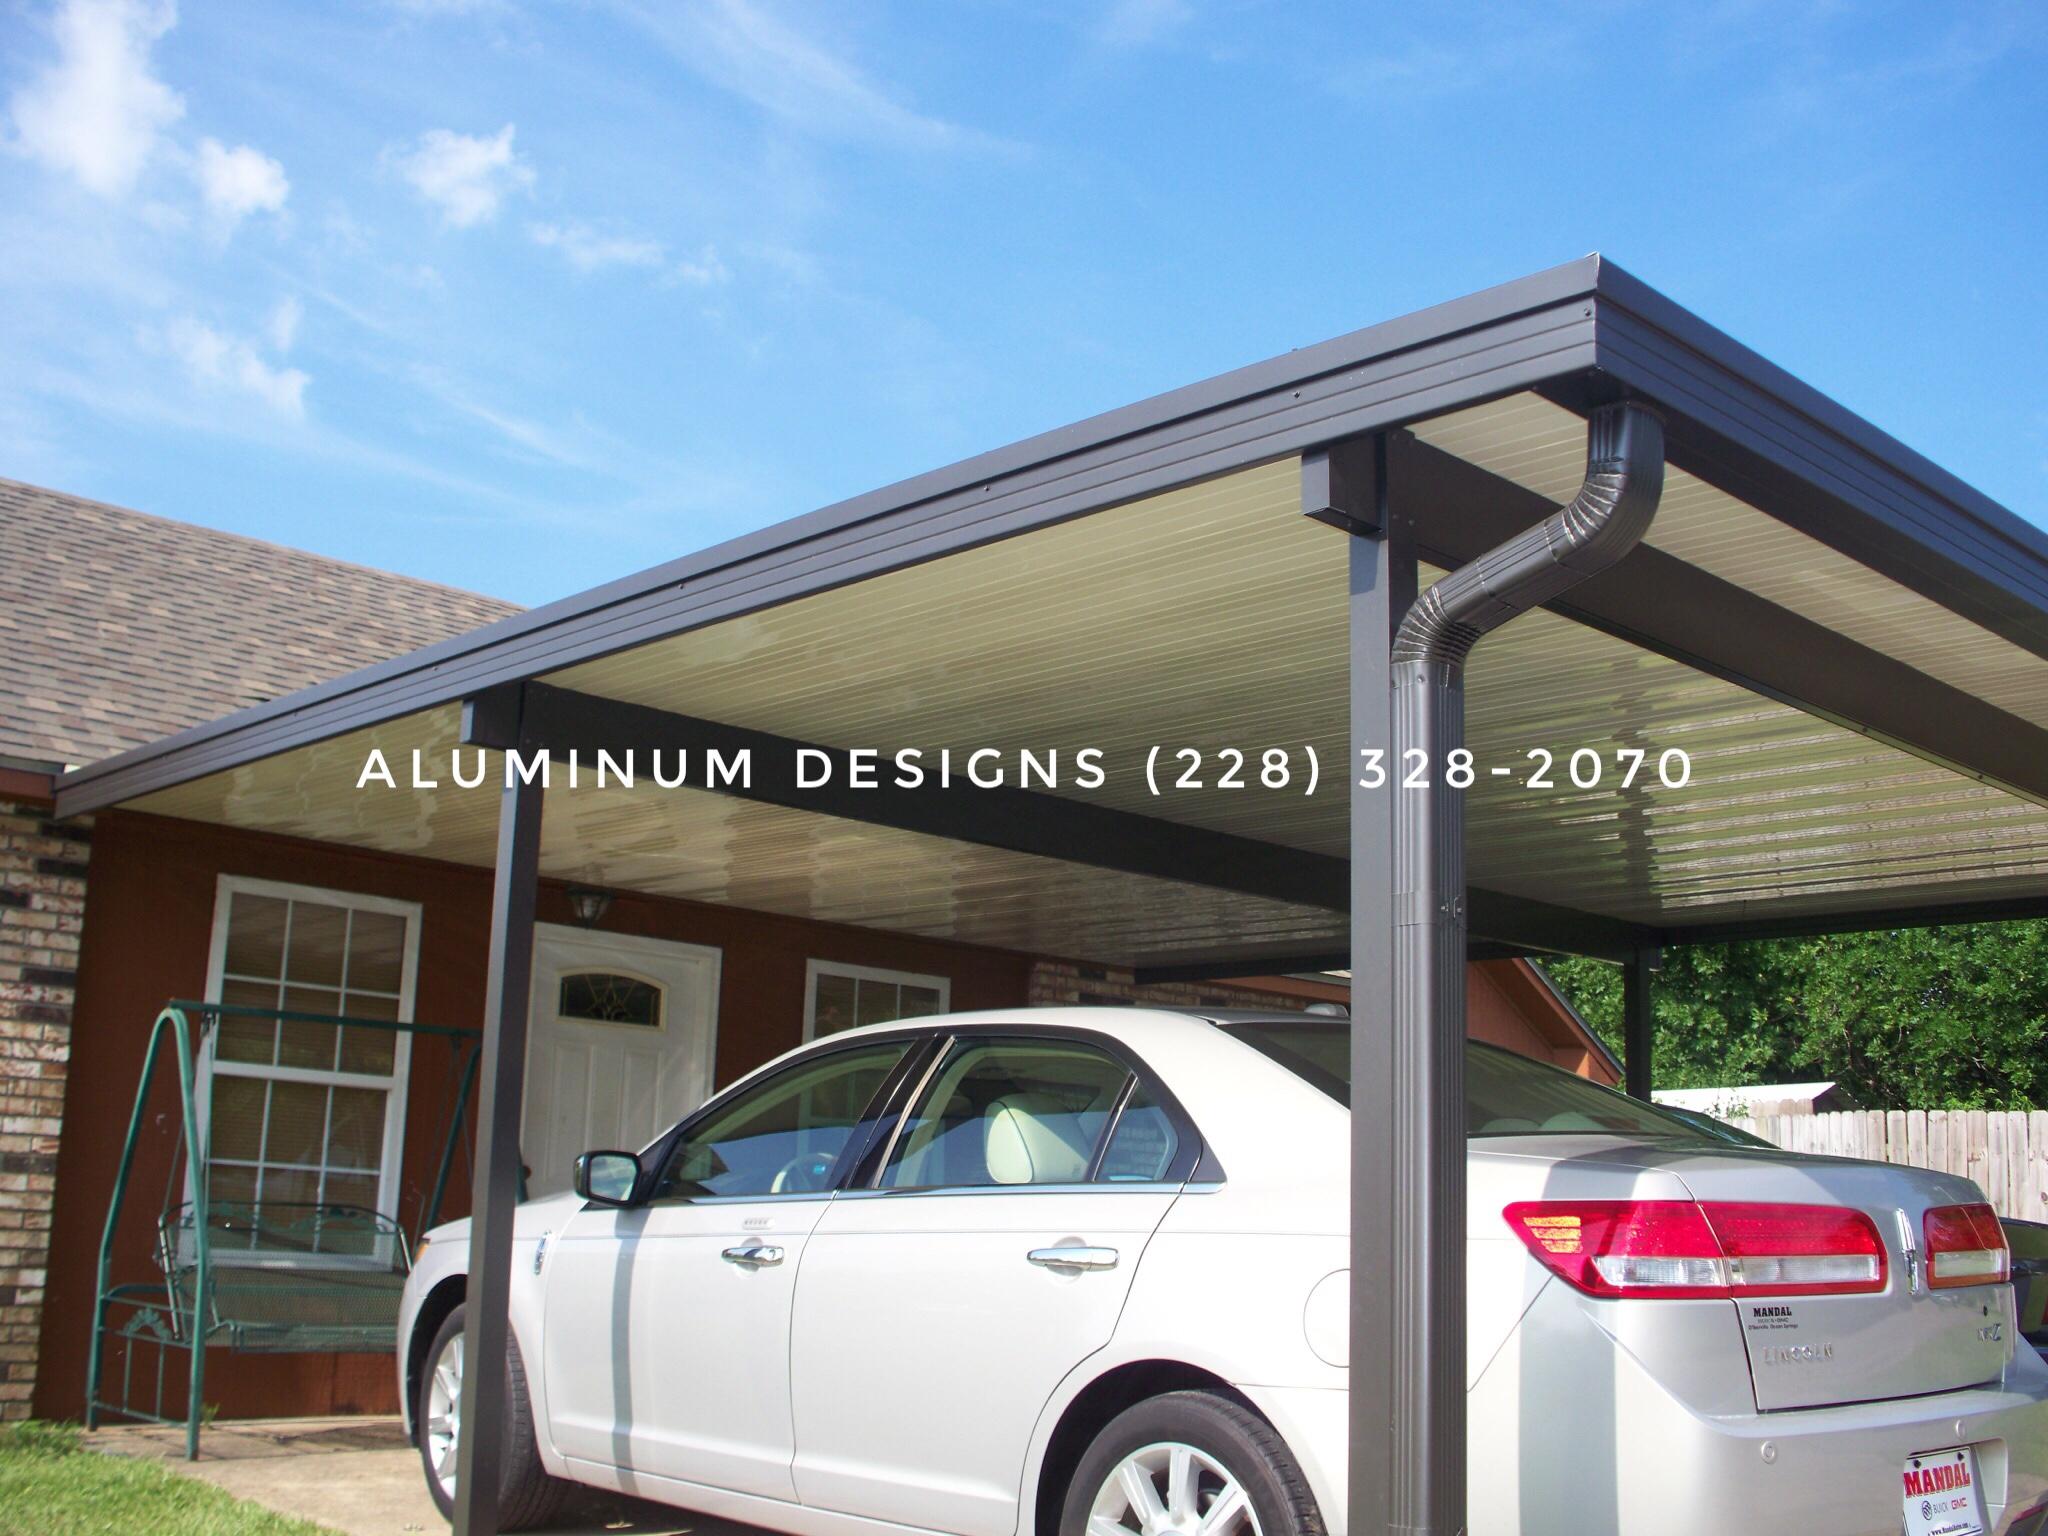 Carport Built by Aluminum Designs of Saucier, MS